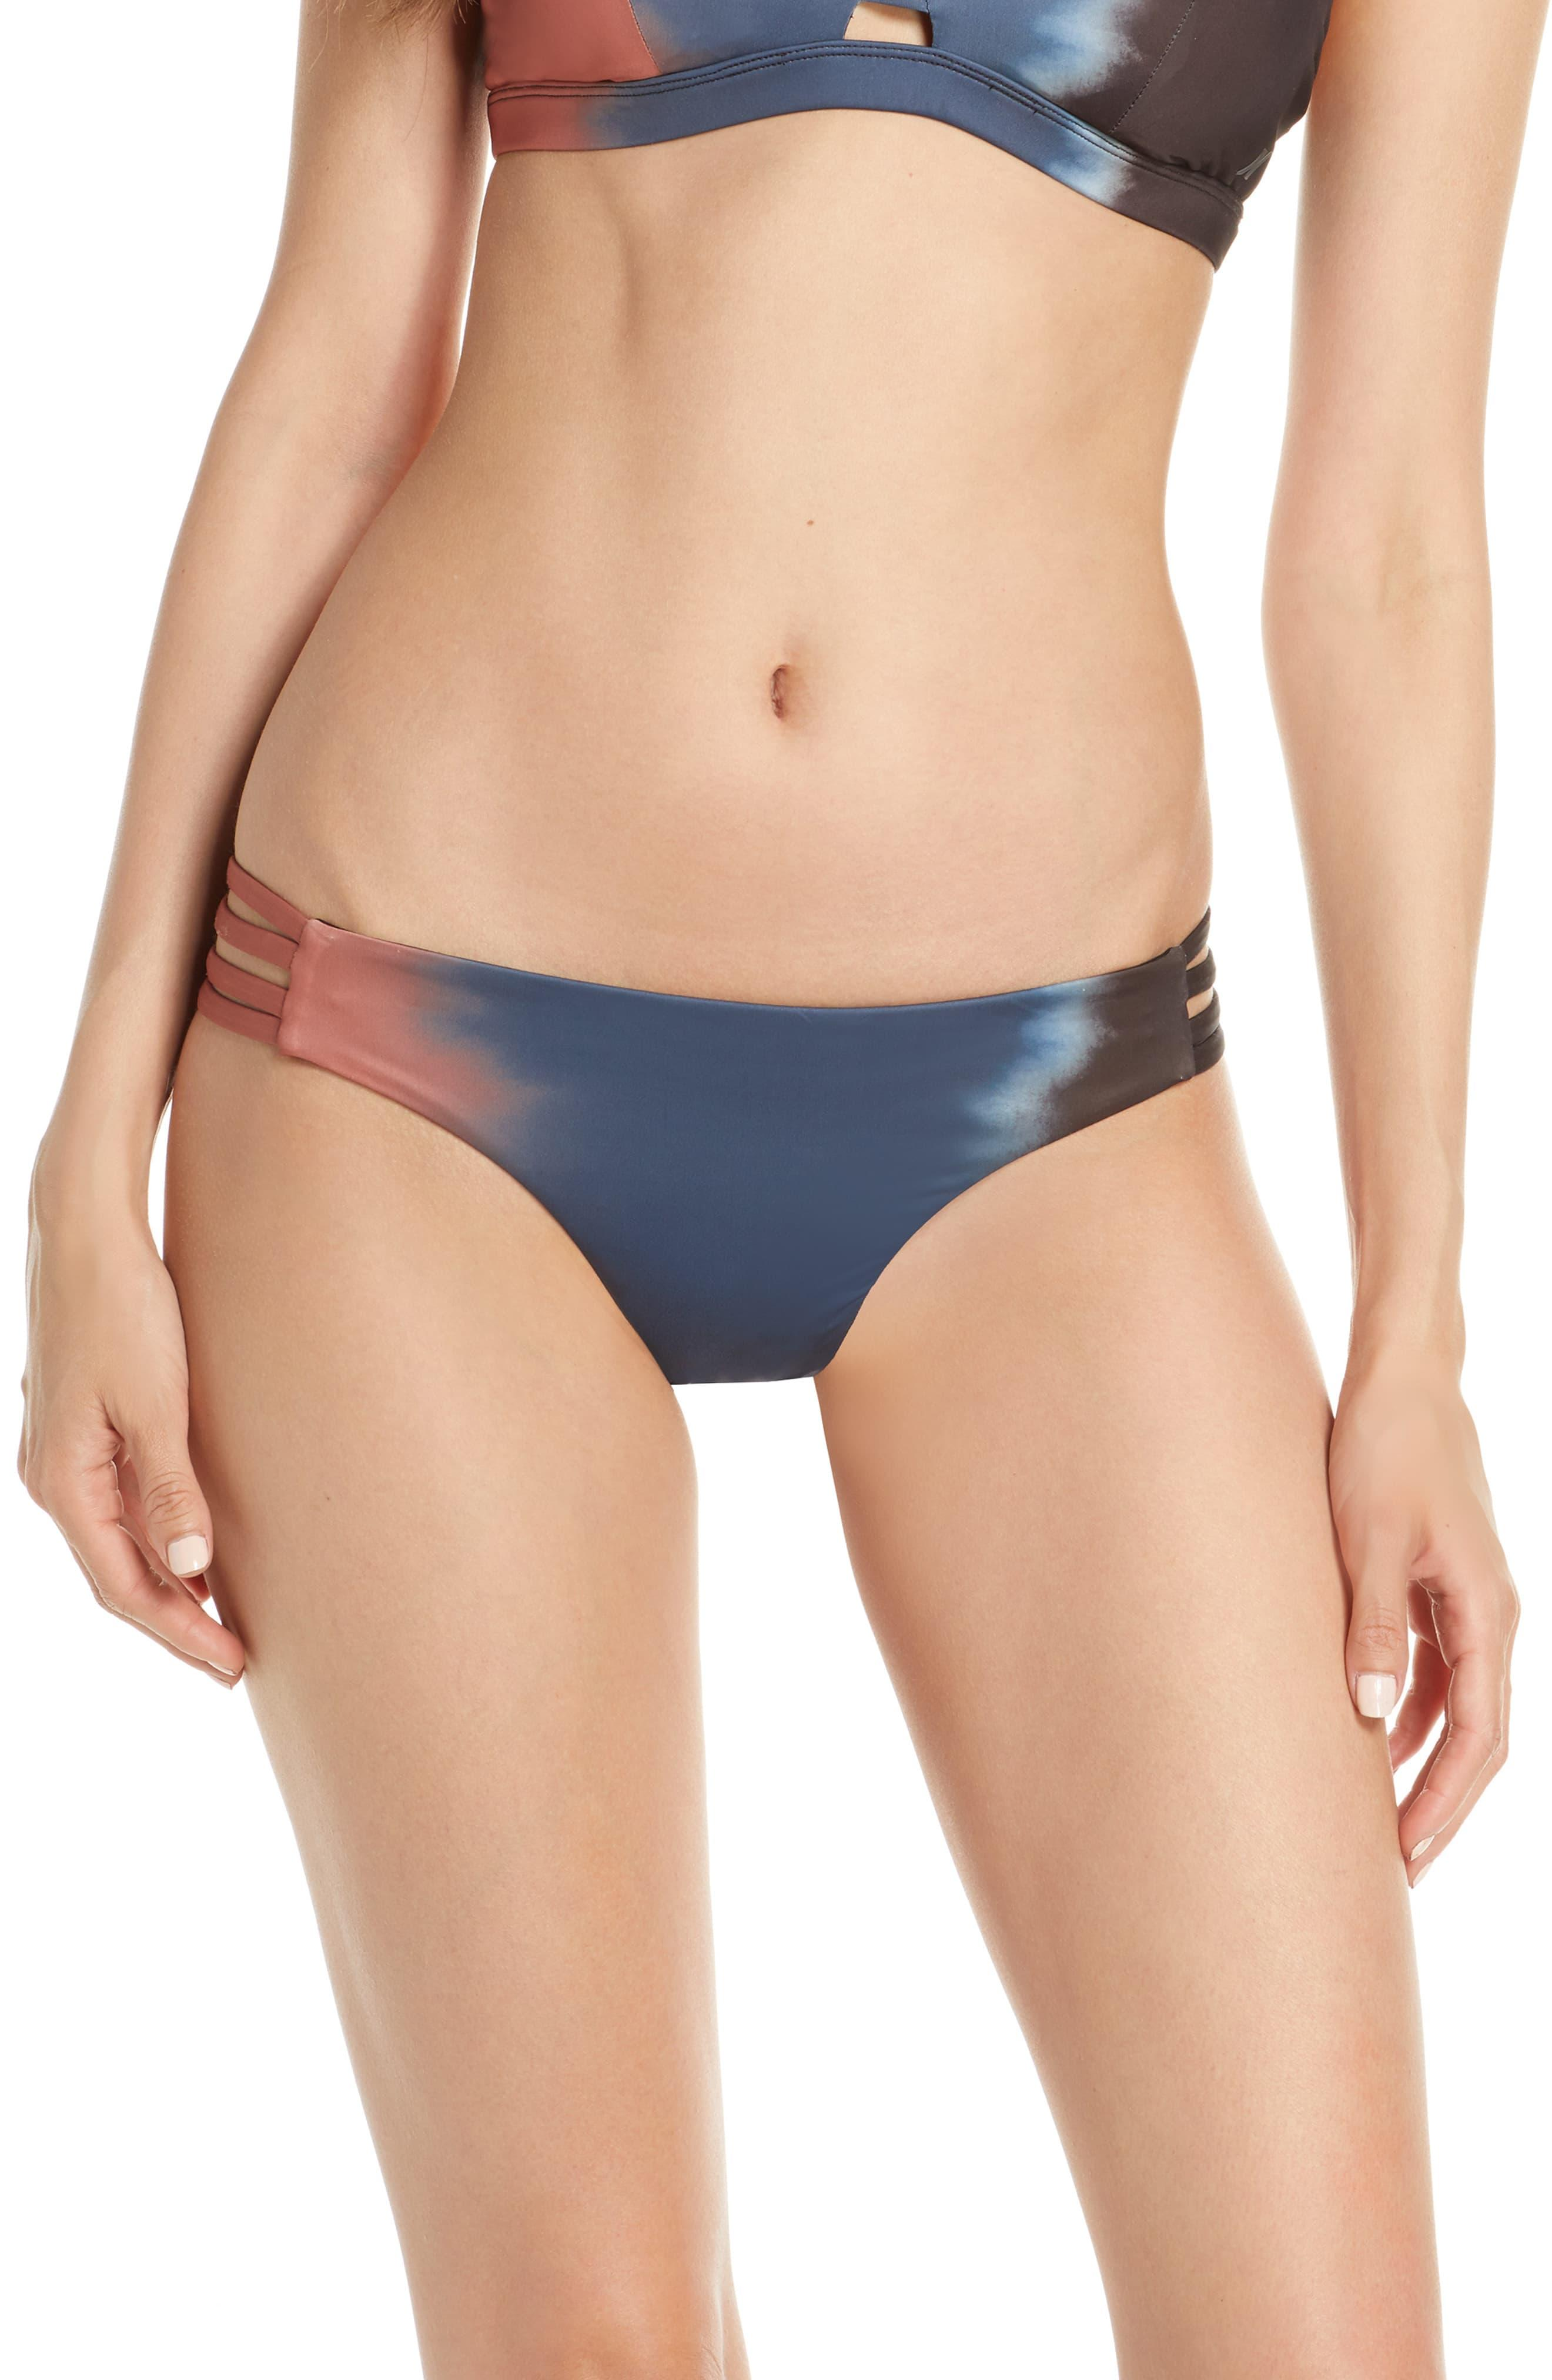 d9fbe33cc08 Hurley Quick Dry Max Gradient Bikini Bottoms in Blue - Lyst